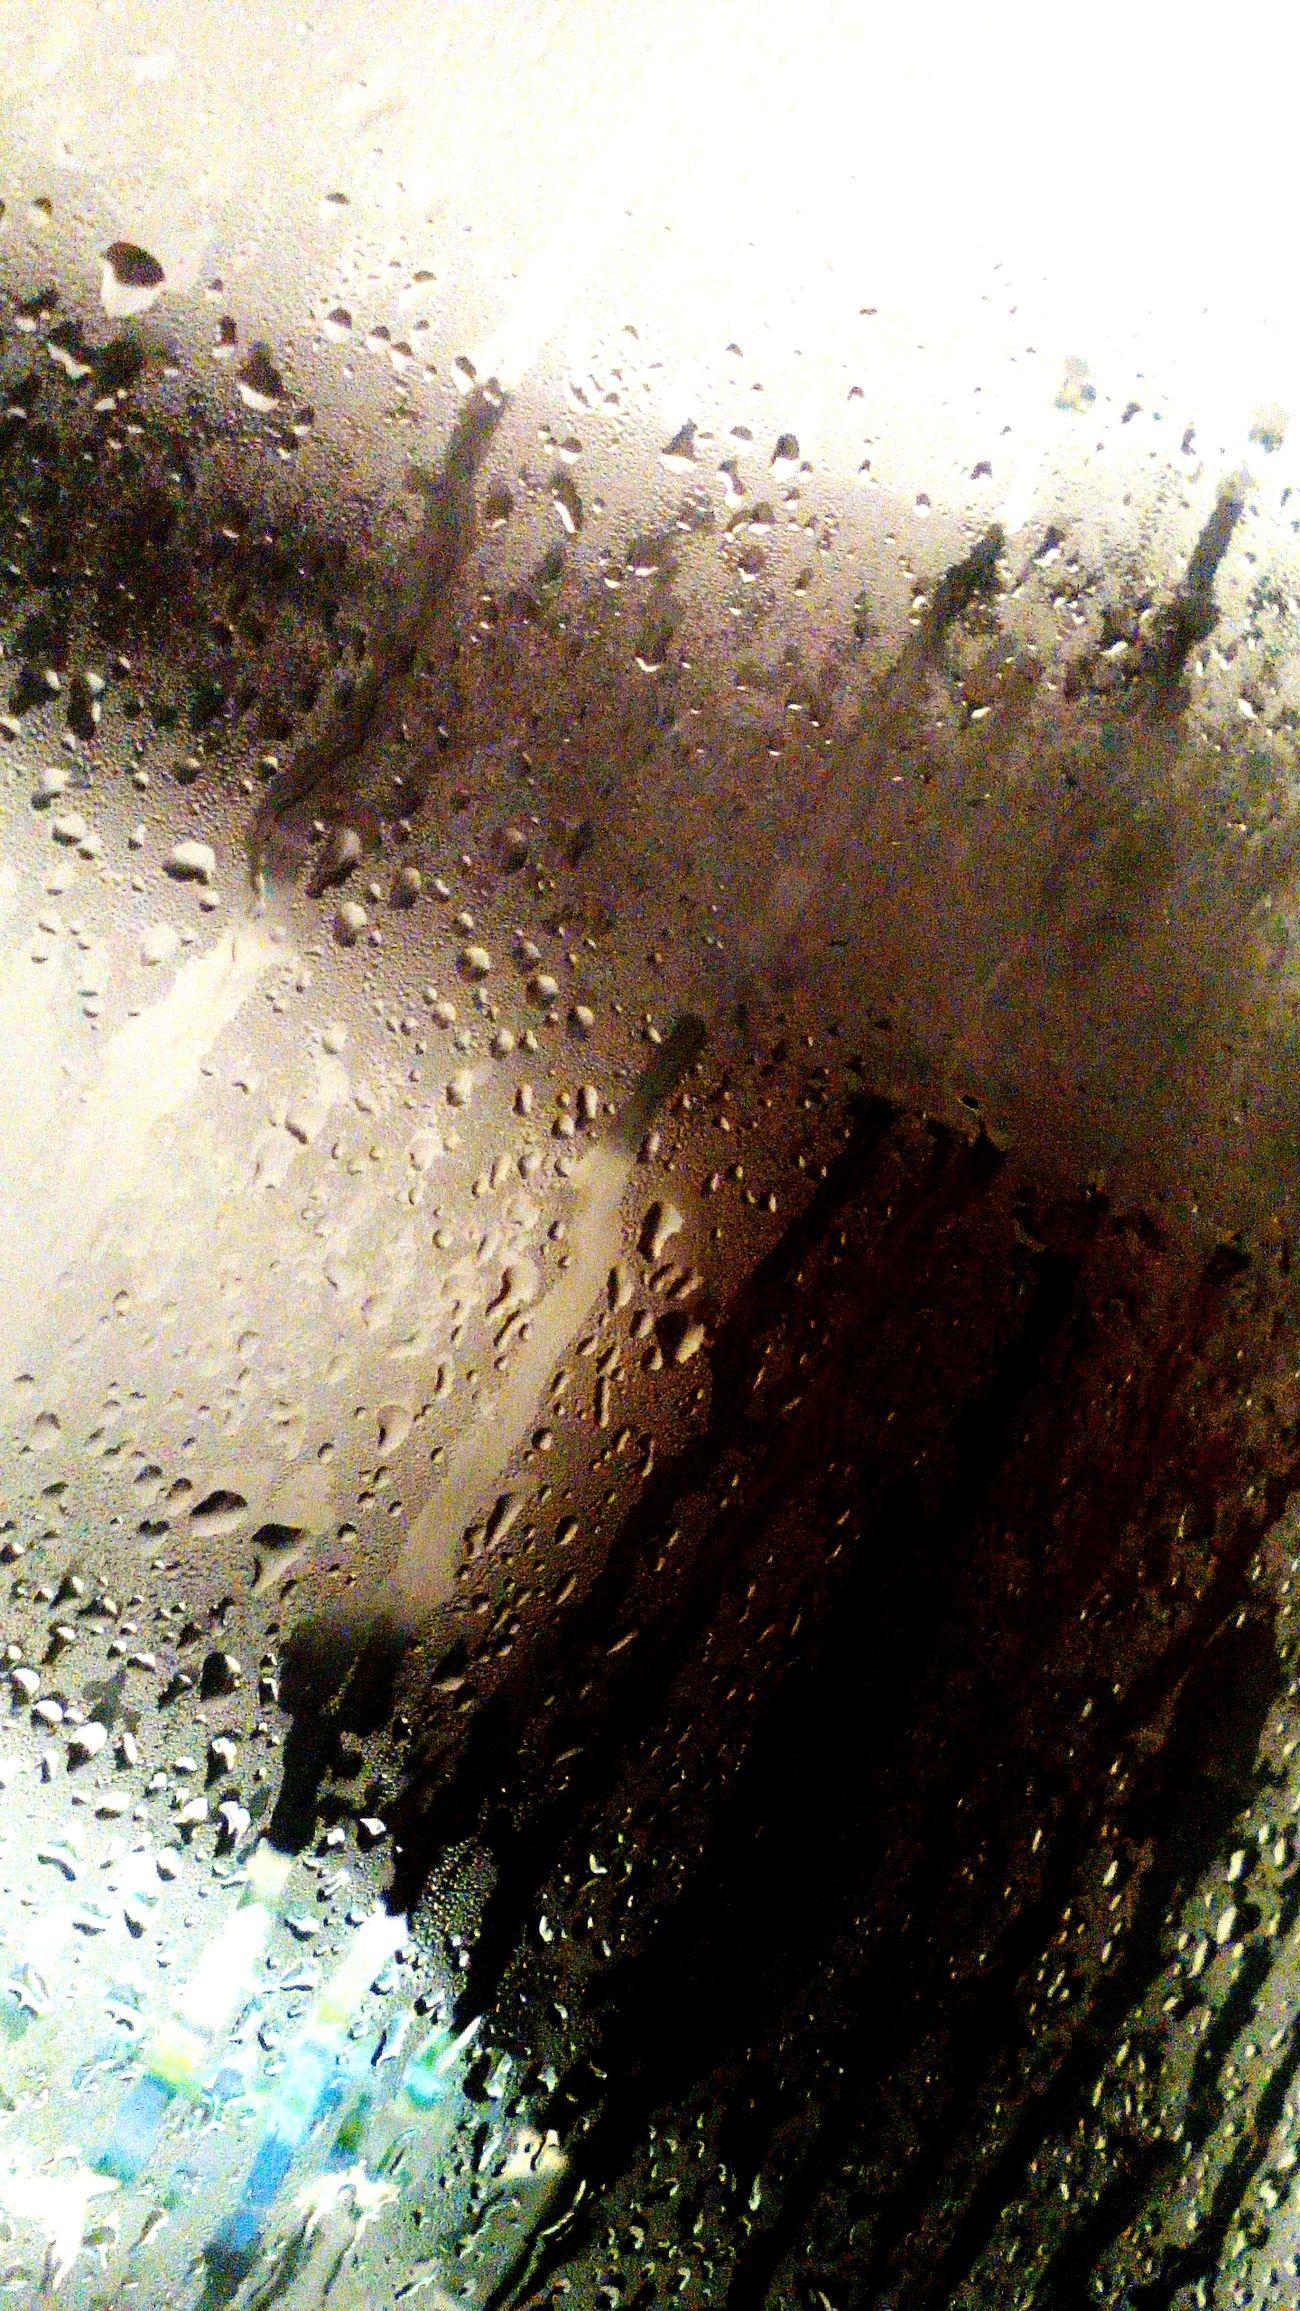 Bathroom Rain Relaxing Cleaning